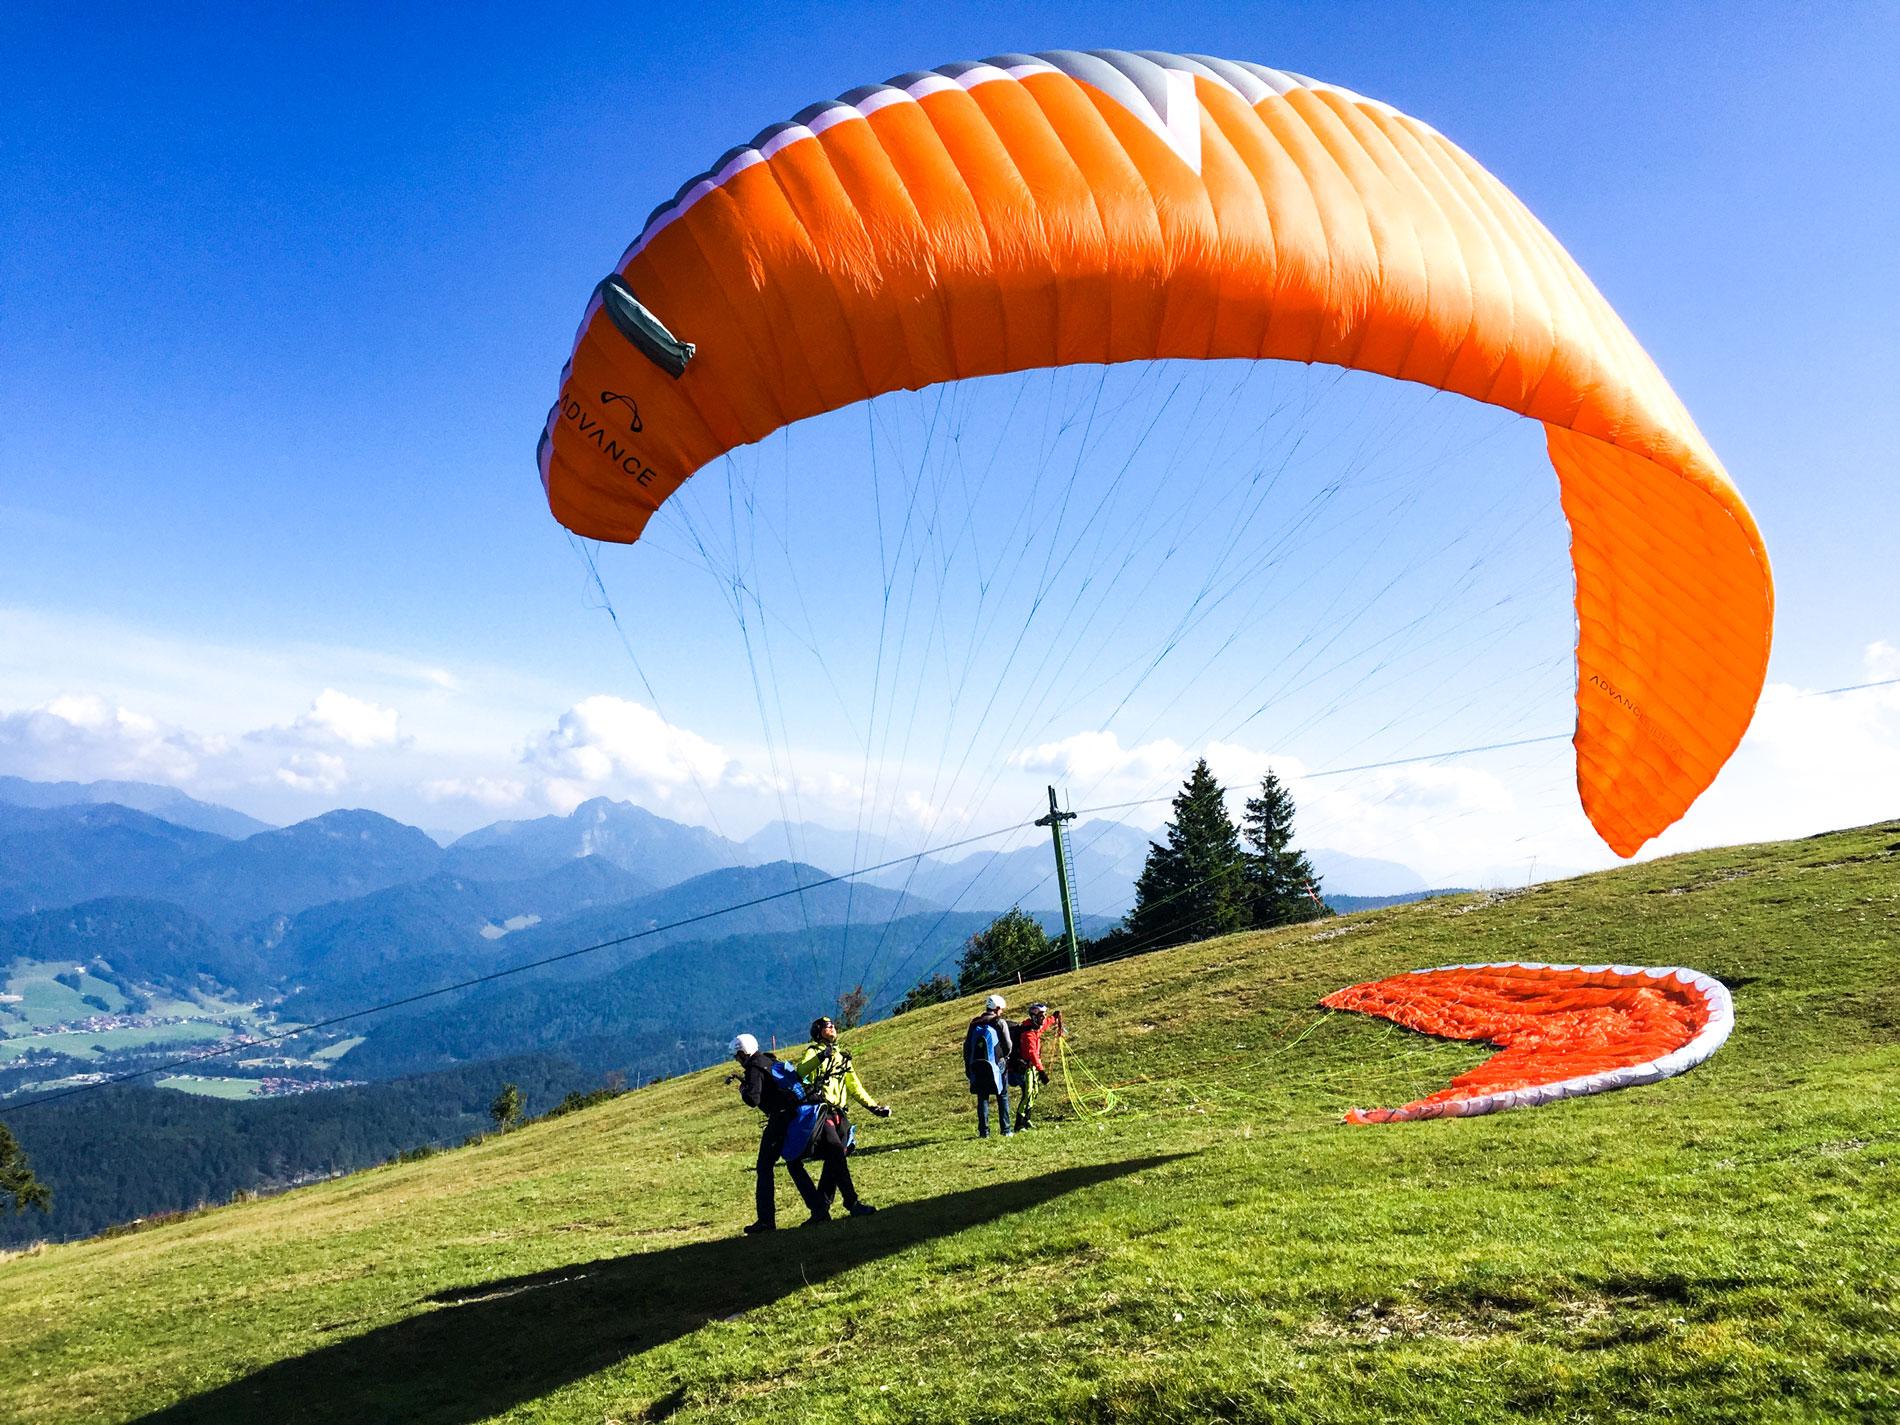 Partner-Doppelflug-Tandemflug-Geschenkgidee-Chiemgau-Kampenwand